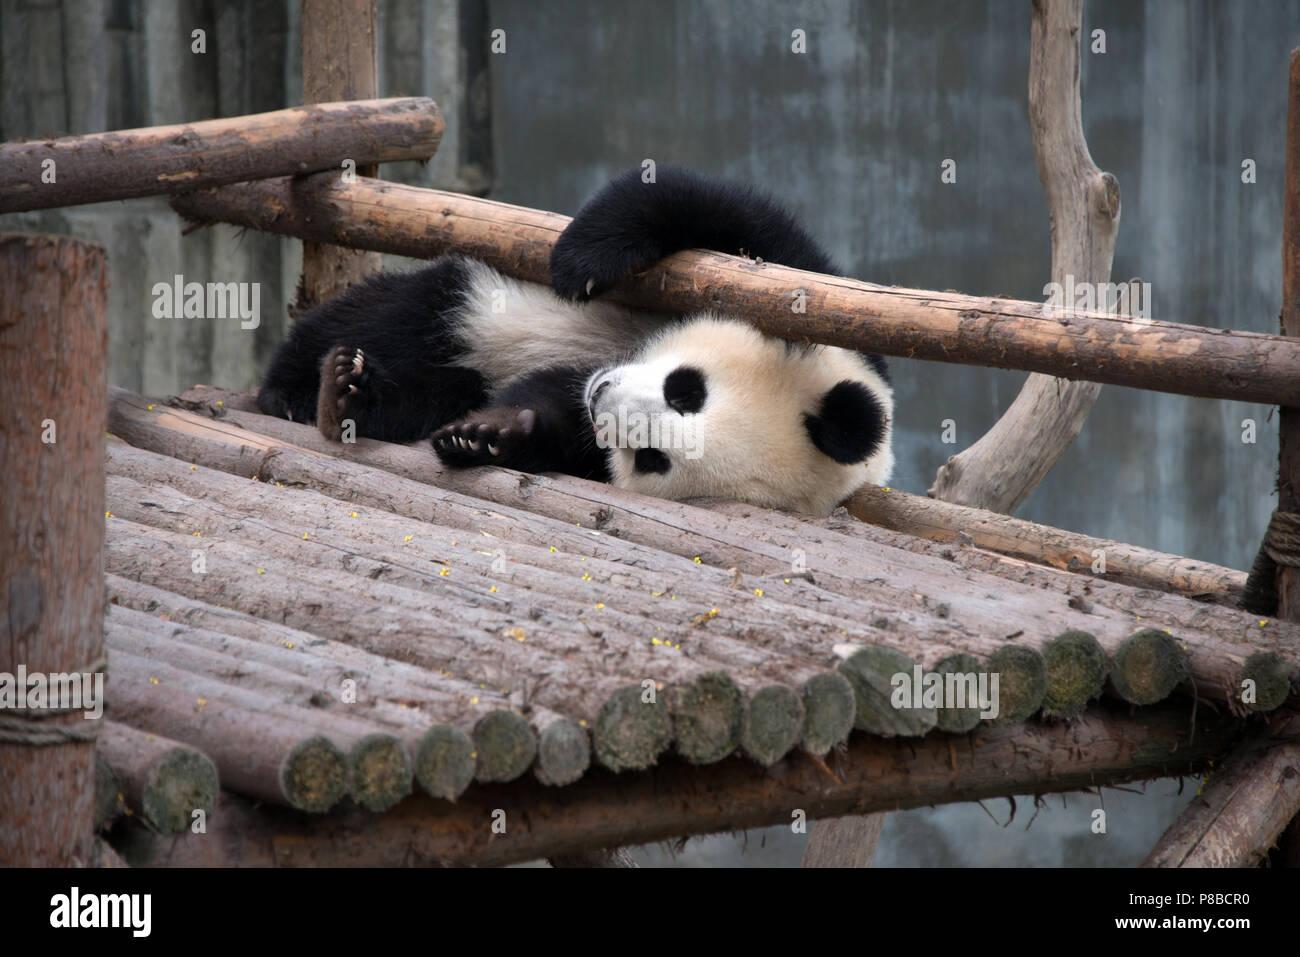 Giant Pandas at the Chengdu breeding centre - Stock Image